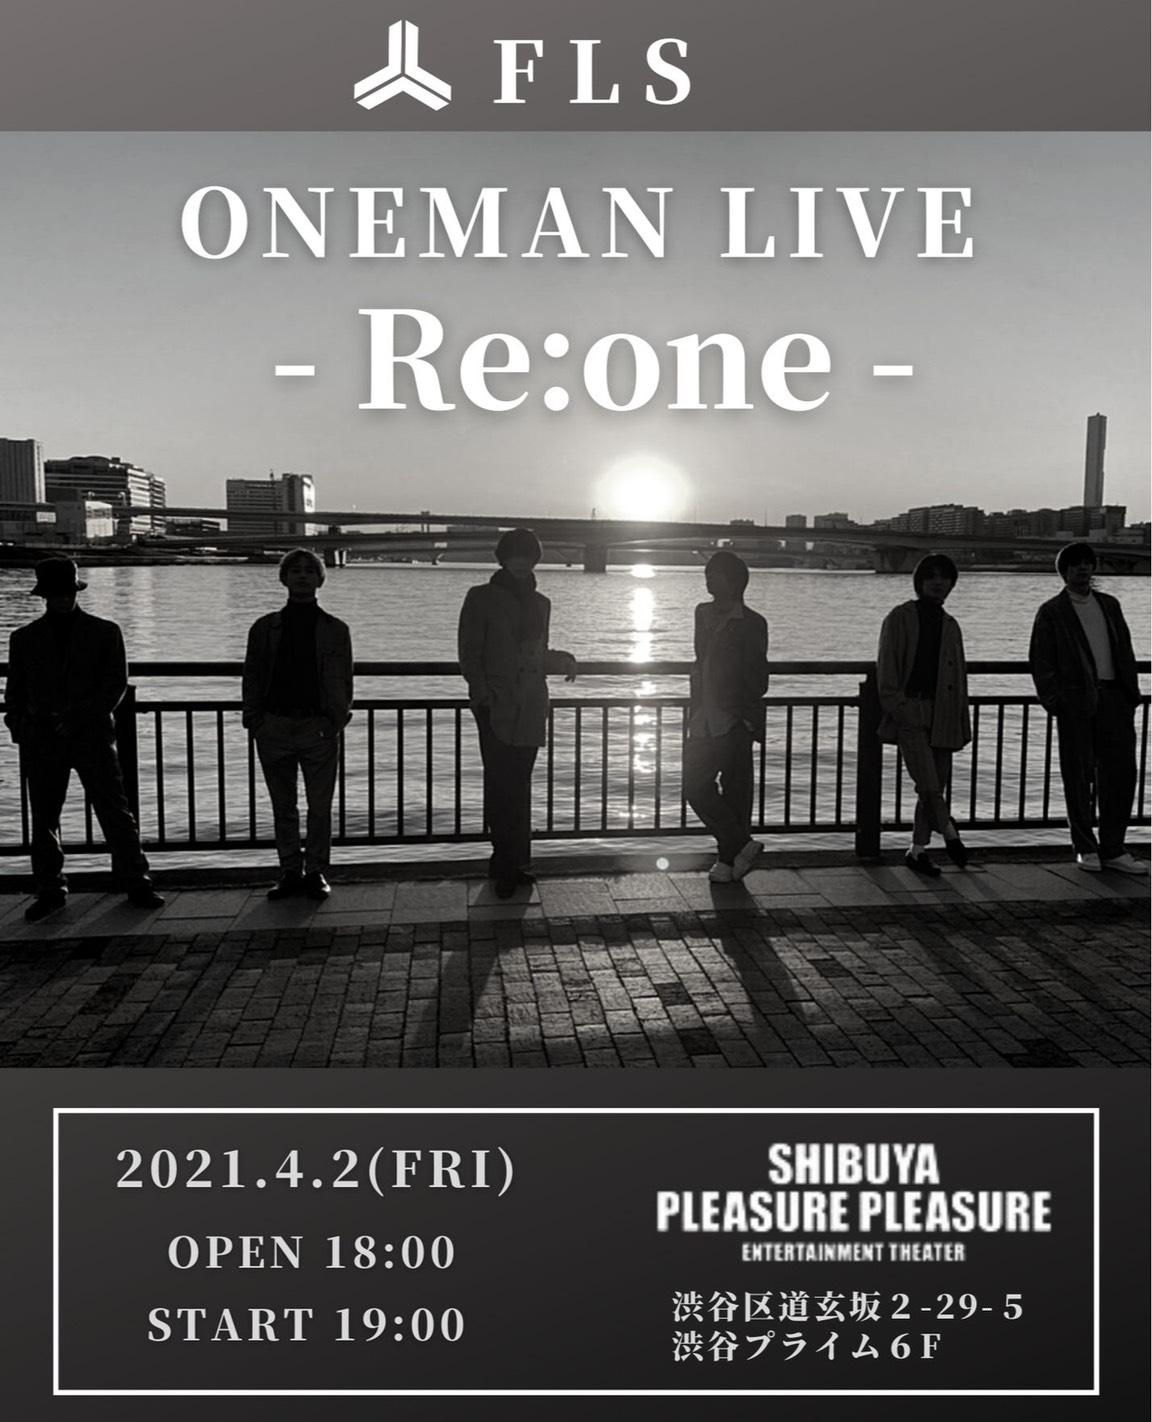 FLSワンマンライブ -Re:one-